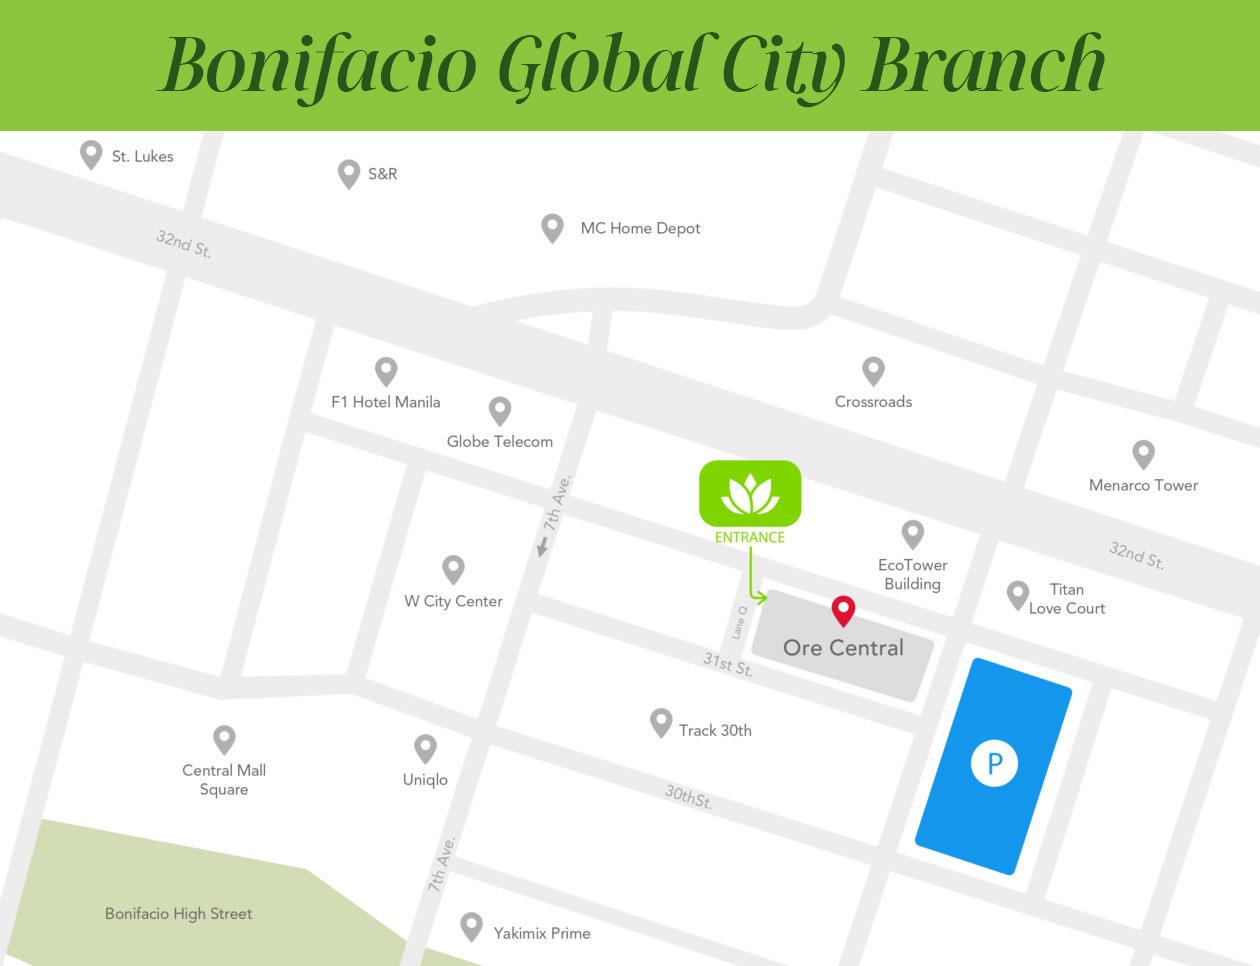 BGC Location Map - Revised